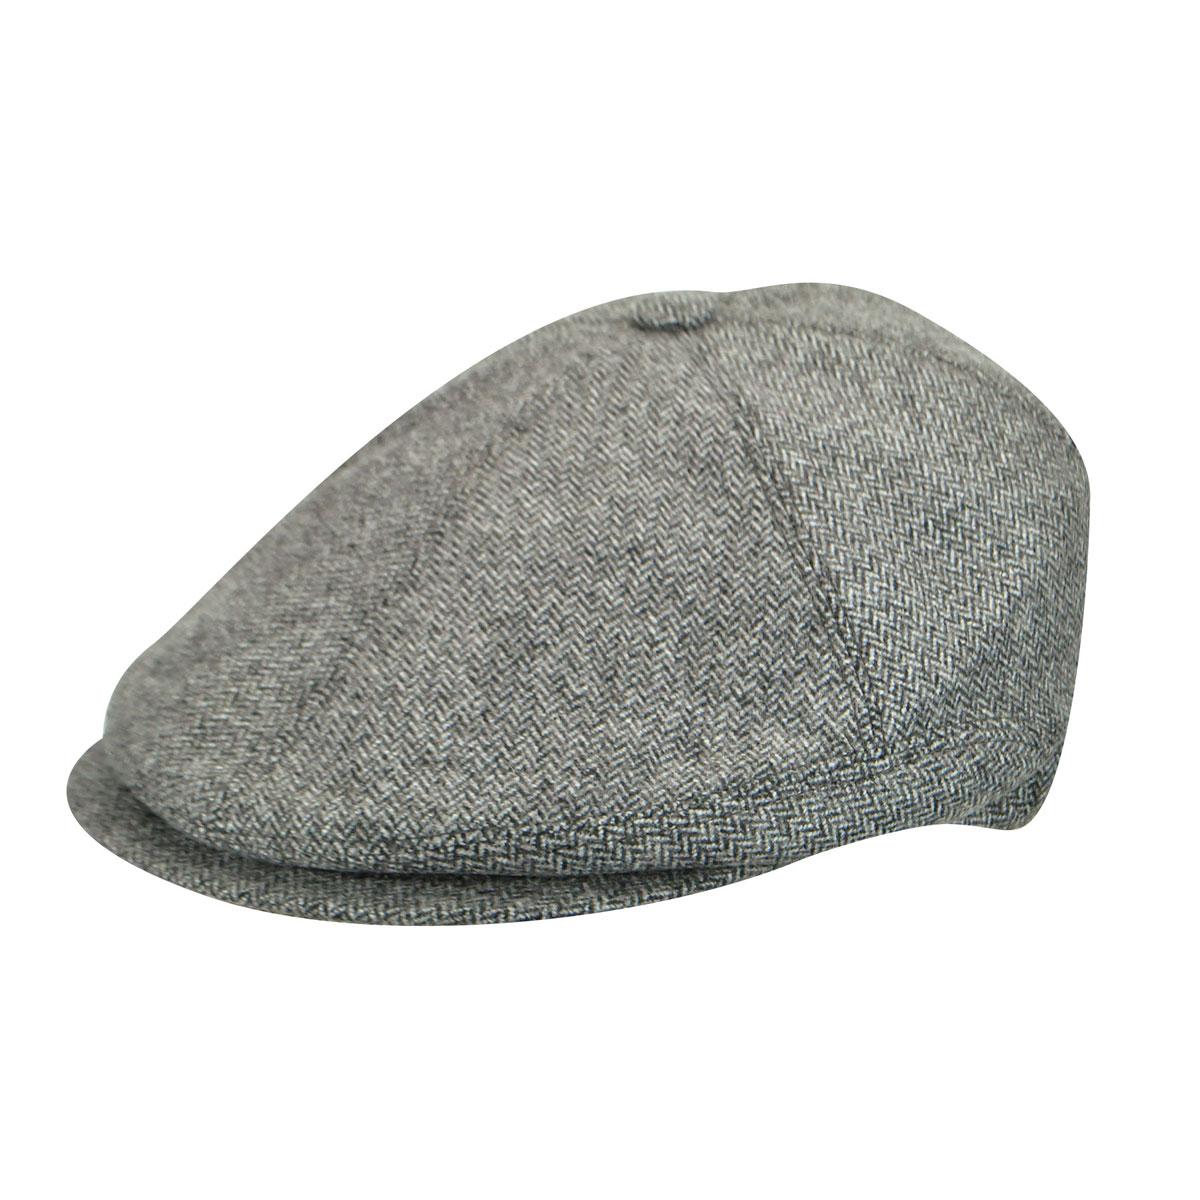 1930s Mens Hat Fashion BB150500047 Wool Newsboy Cap $125.00 AT vintagedancer.com